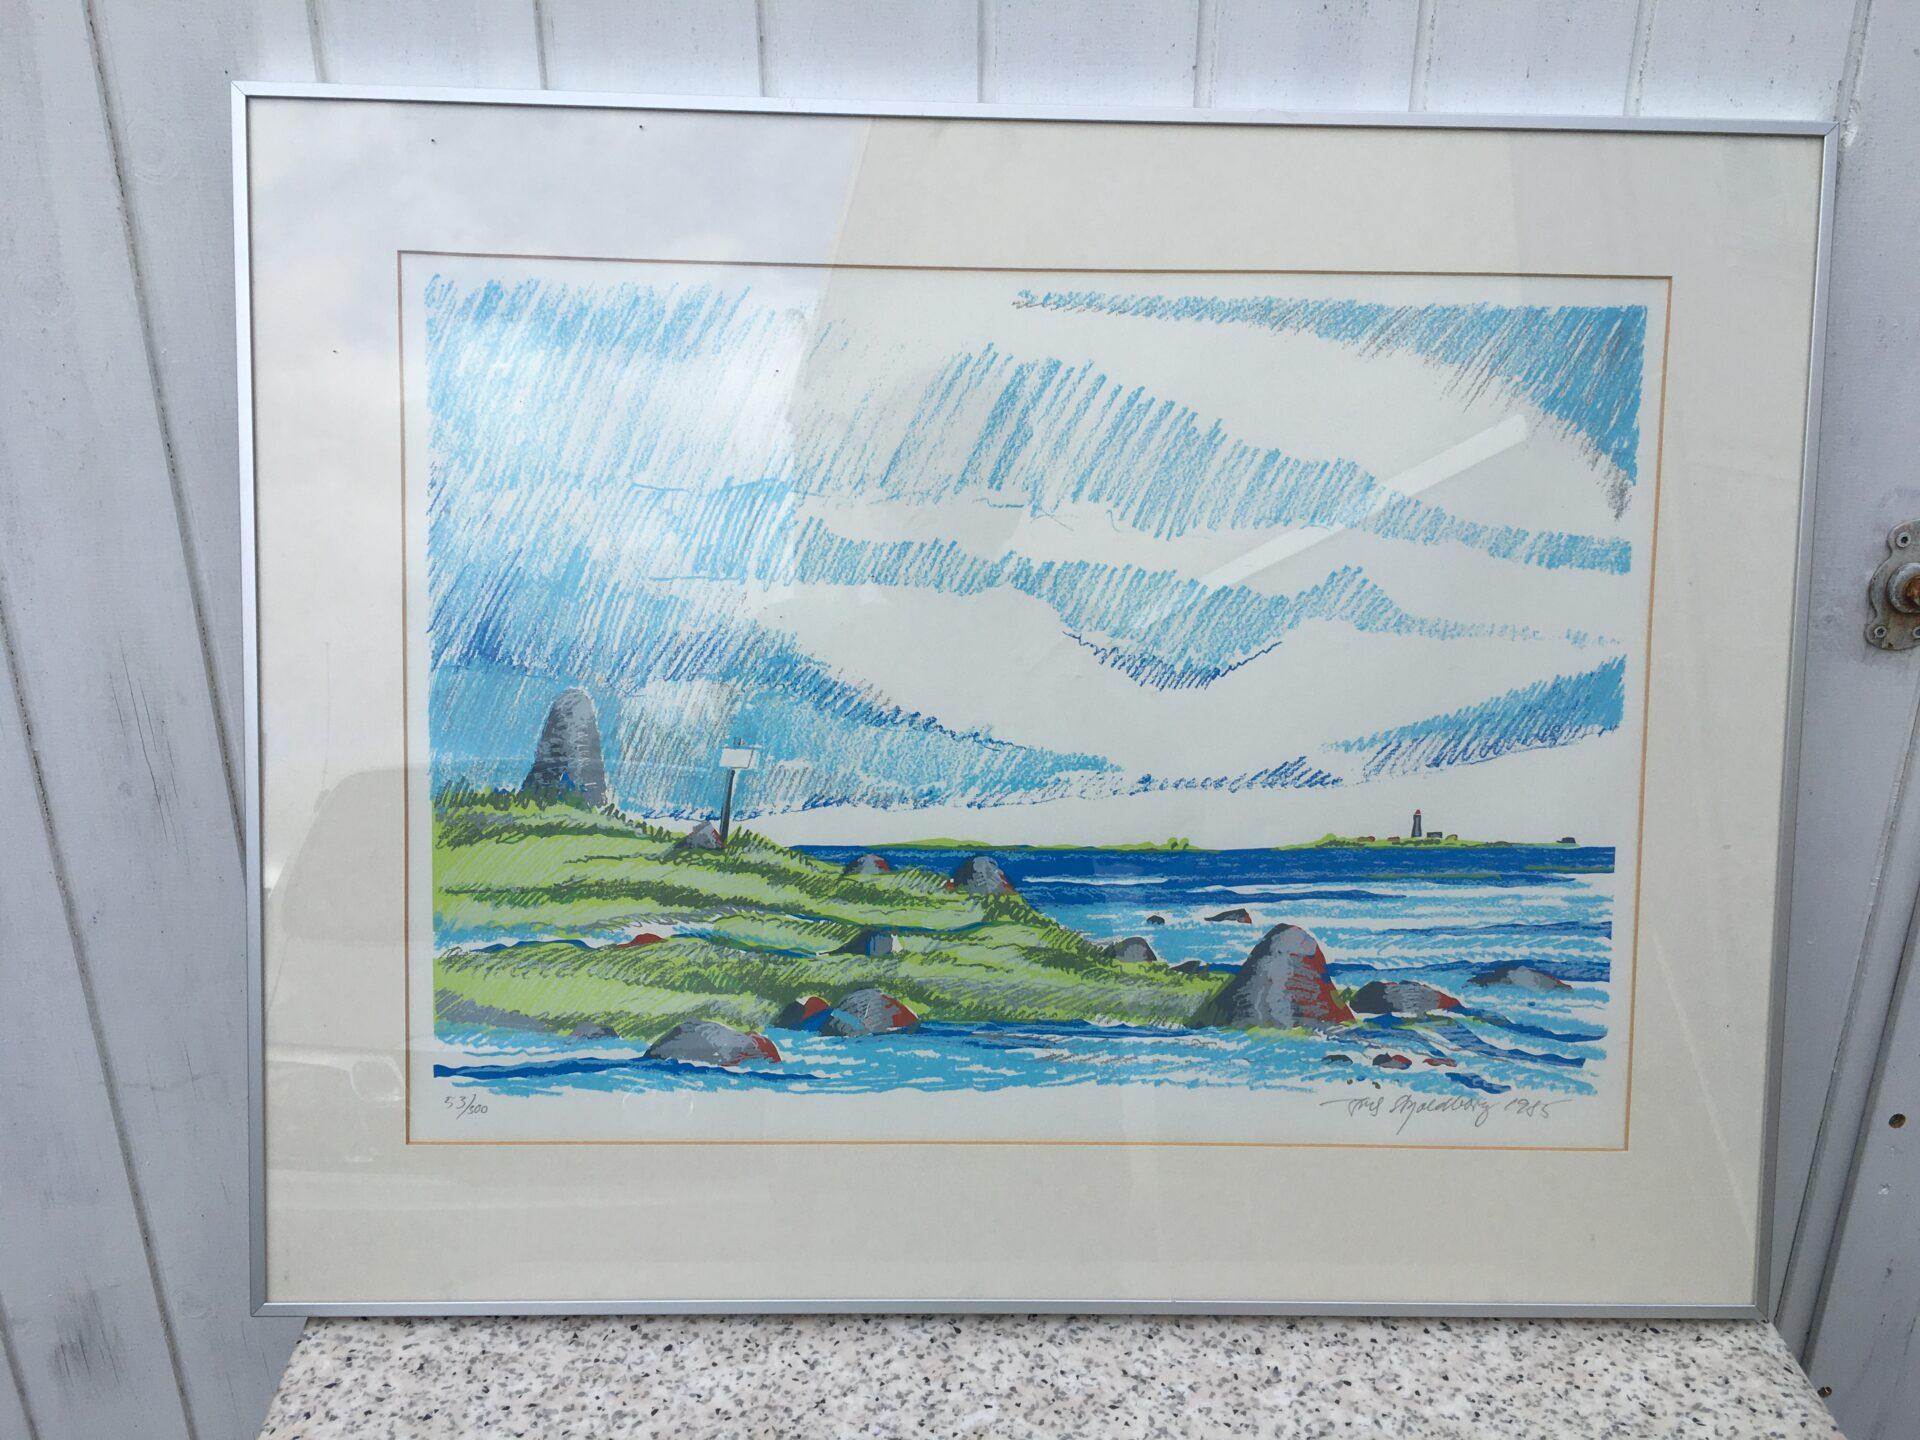 Erik Skjoldborg, litografi nr. 53/300, signeret i 85, rammemål 57x73 cm, pris 400 kr